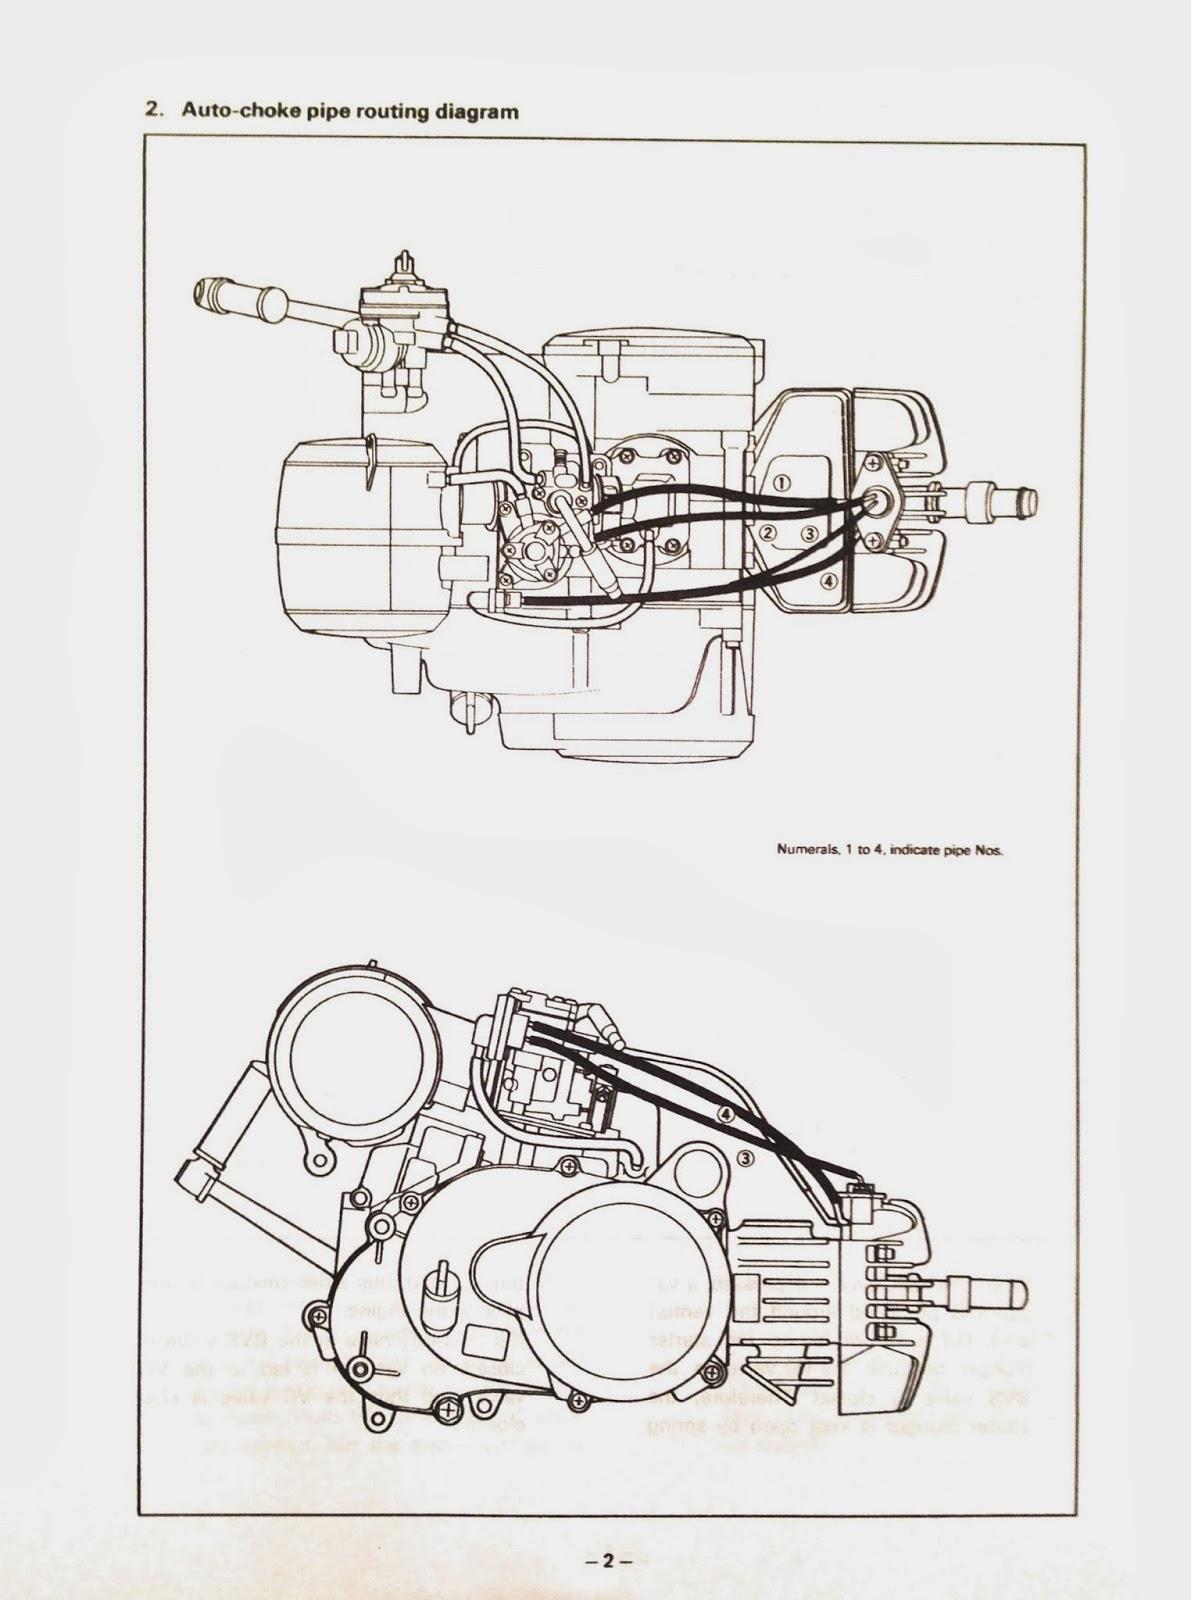 yamaha lc50 yamaha lc50 service manual rh yamahalc50 blogspot com Yamaha 90 Outboard Wiring Diagram Yamaha XS1100 Wiring-Diagram